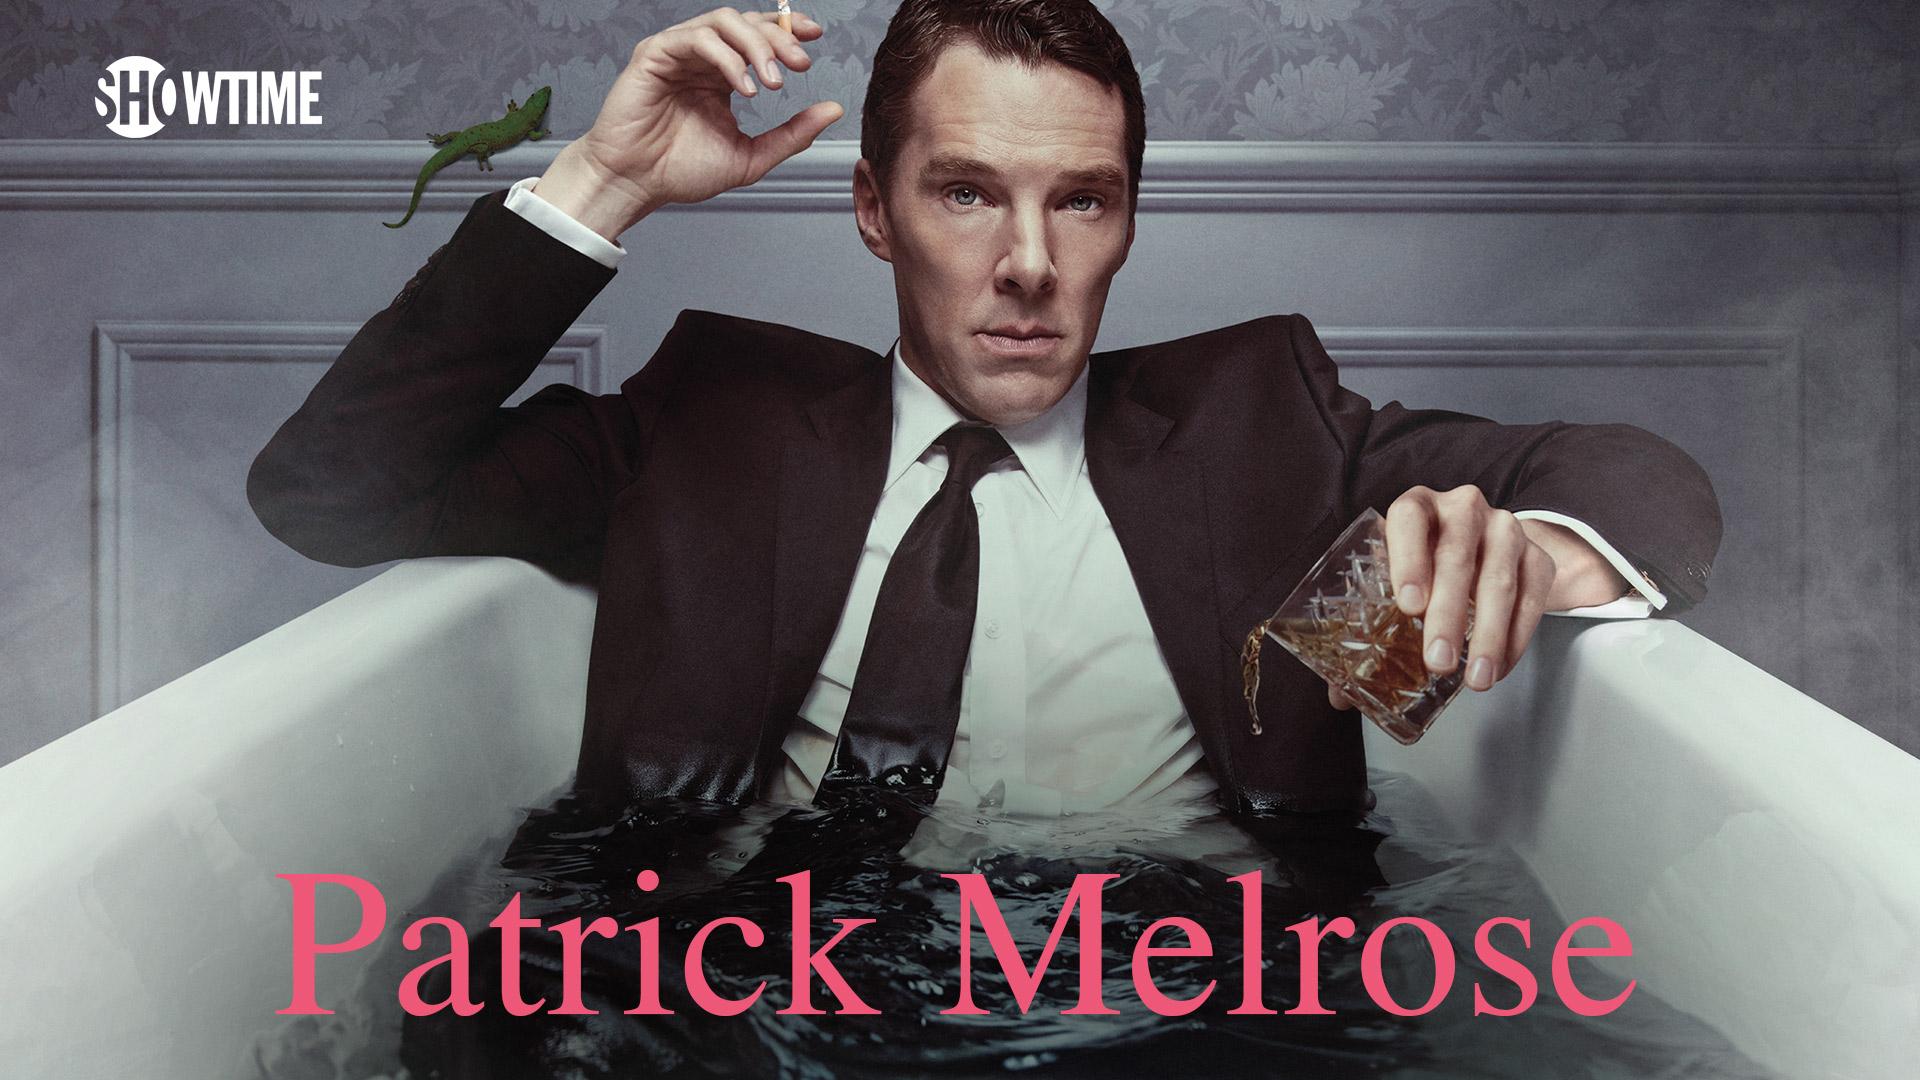 Patrick Melrose Season 1